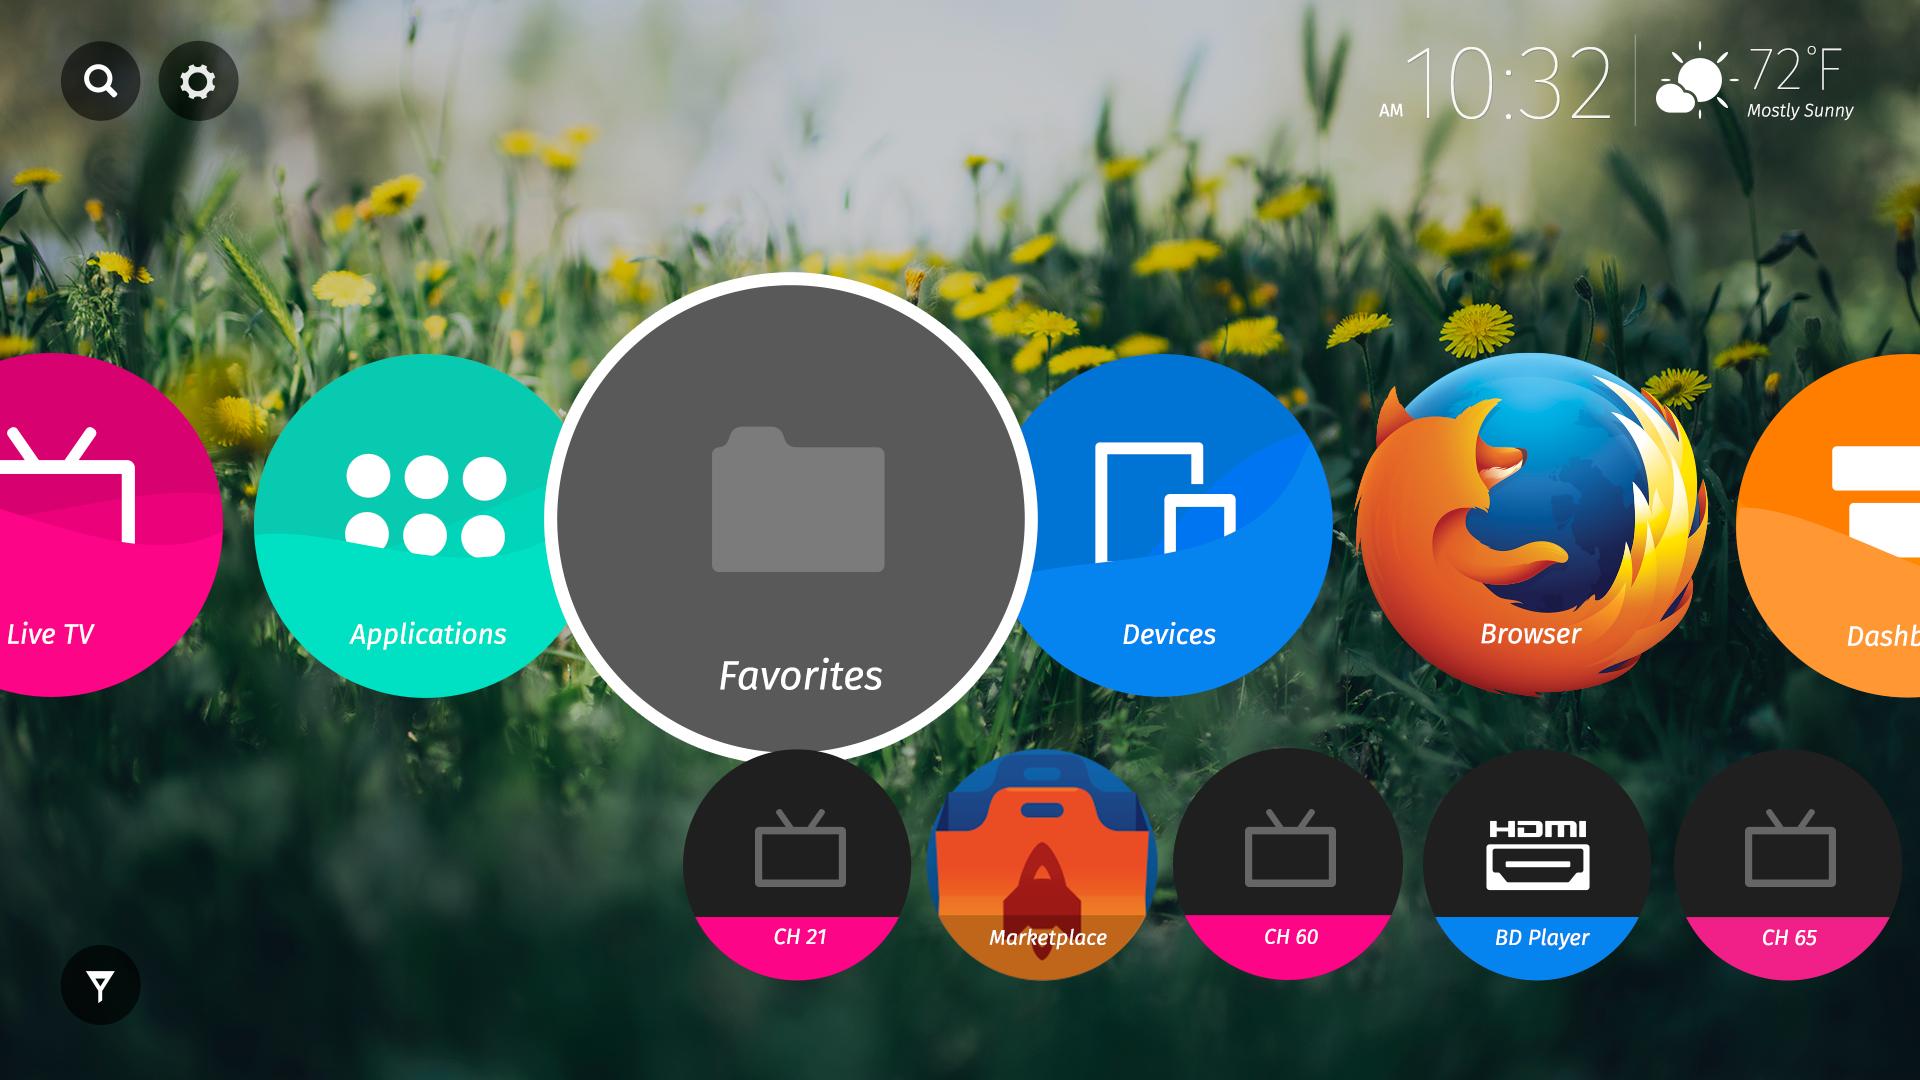 https://blog.mozilla.org/press/files/2015/01/Life-Screen-and-Firefox-OS-Customizing-Home-Screen.jpg